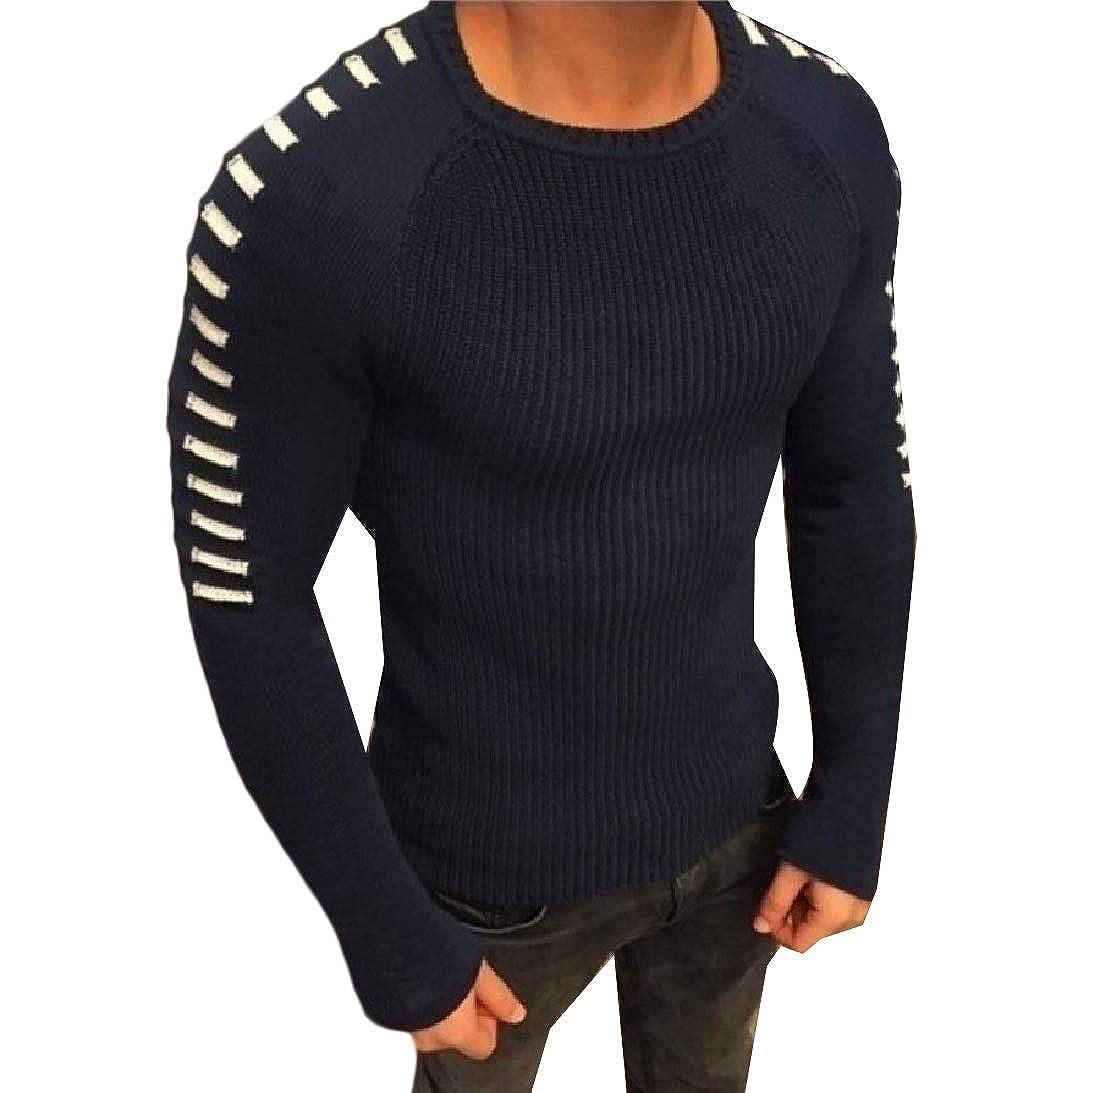 YUNY Mens Splicing Plus Size Jacquard Stretchy Outwear Sweater Top Dark Blue 2XL